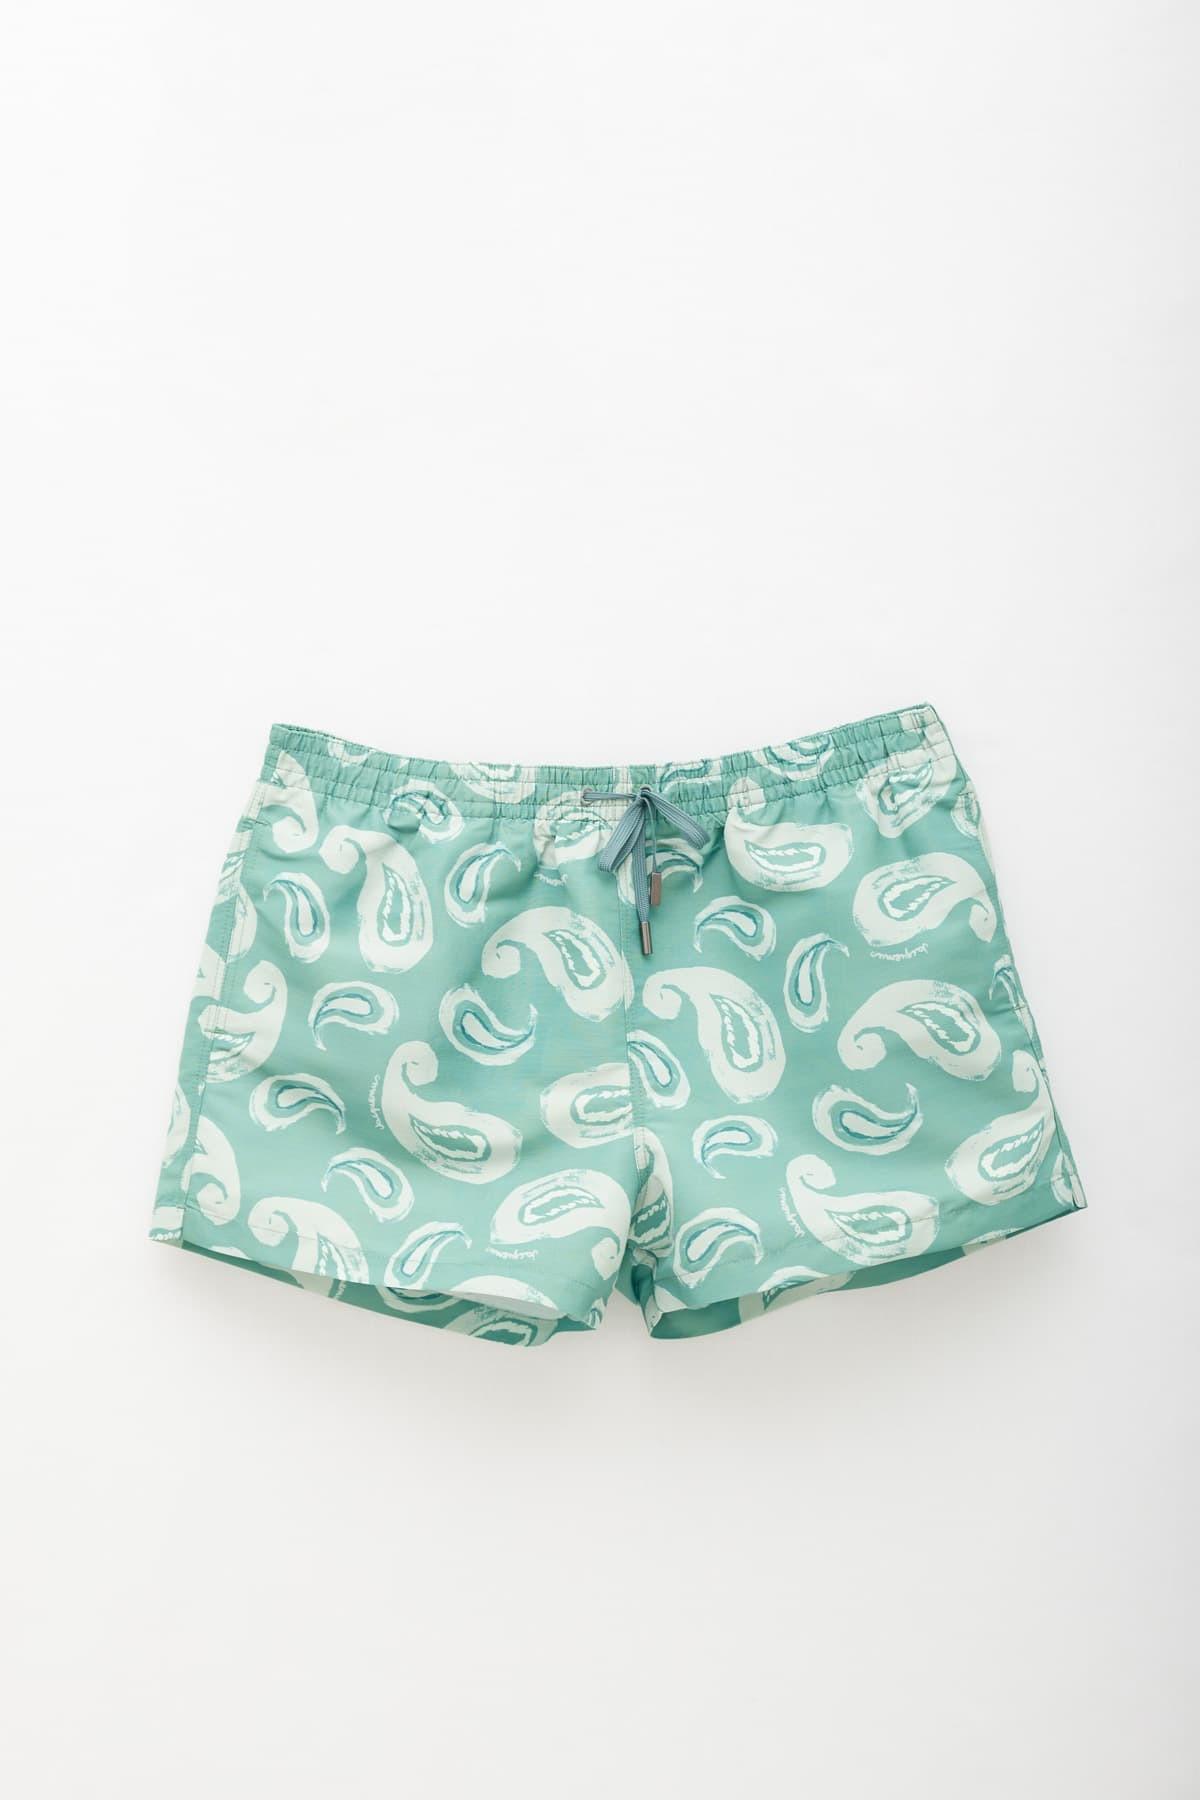 Comprar Comme Des Garcons SHIRT White Yue Minjun T-Shirt FG-T003